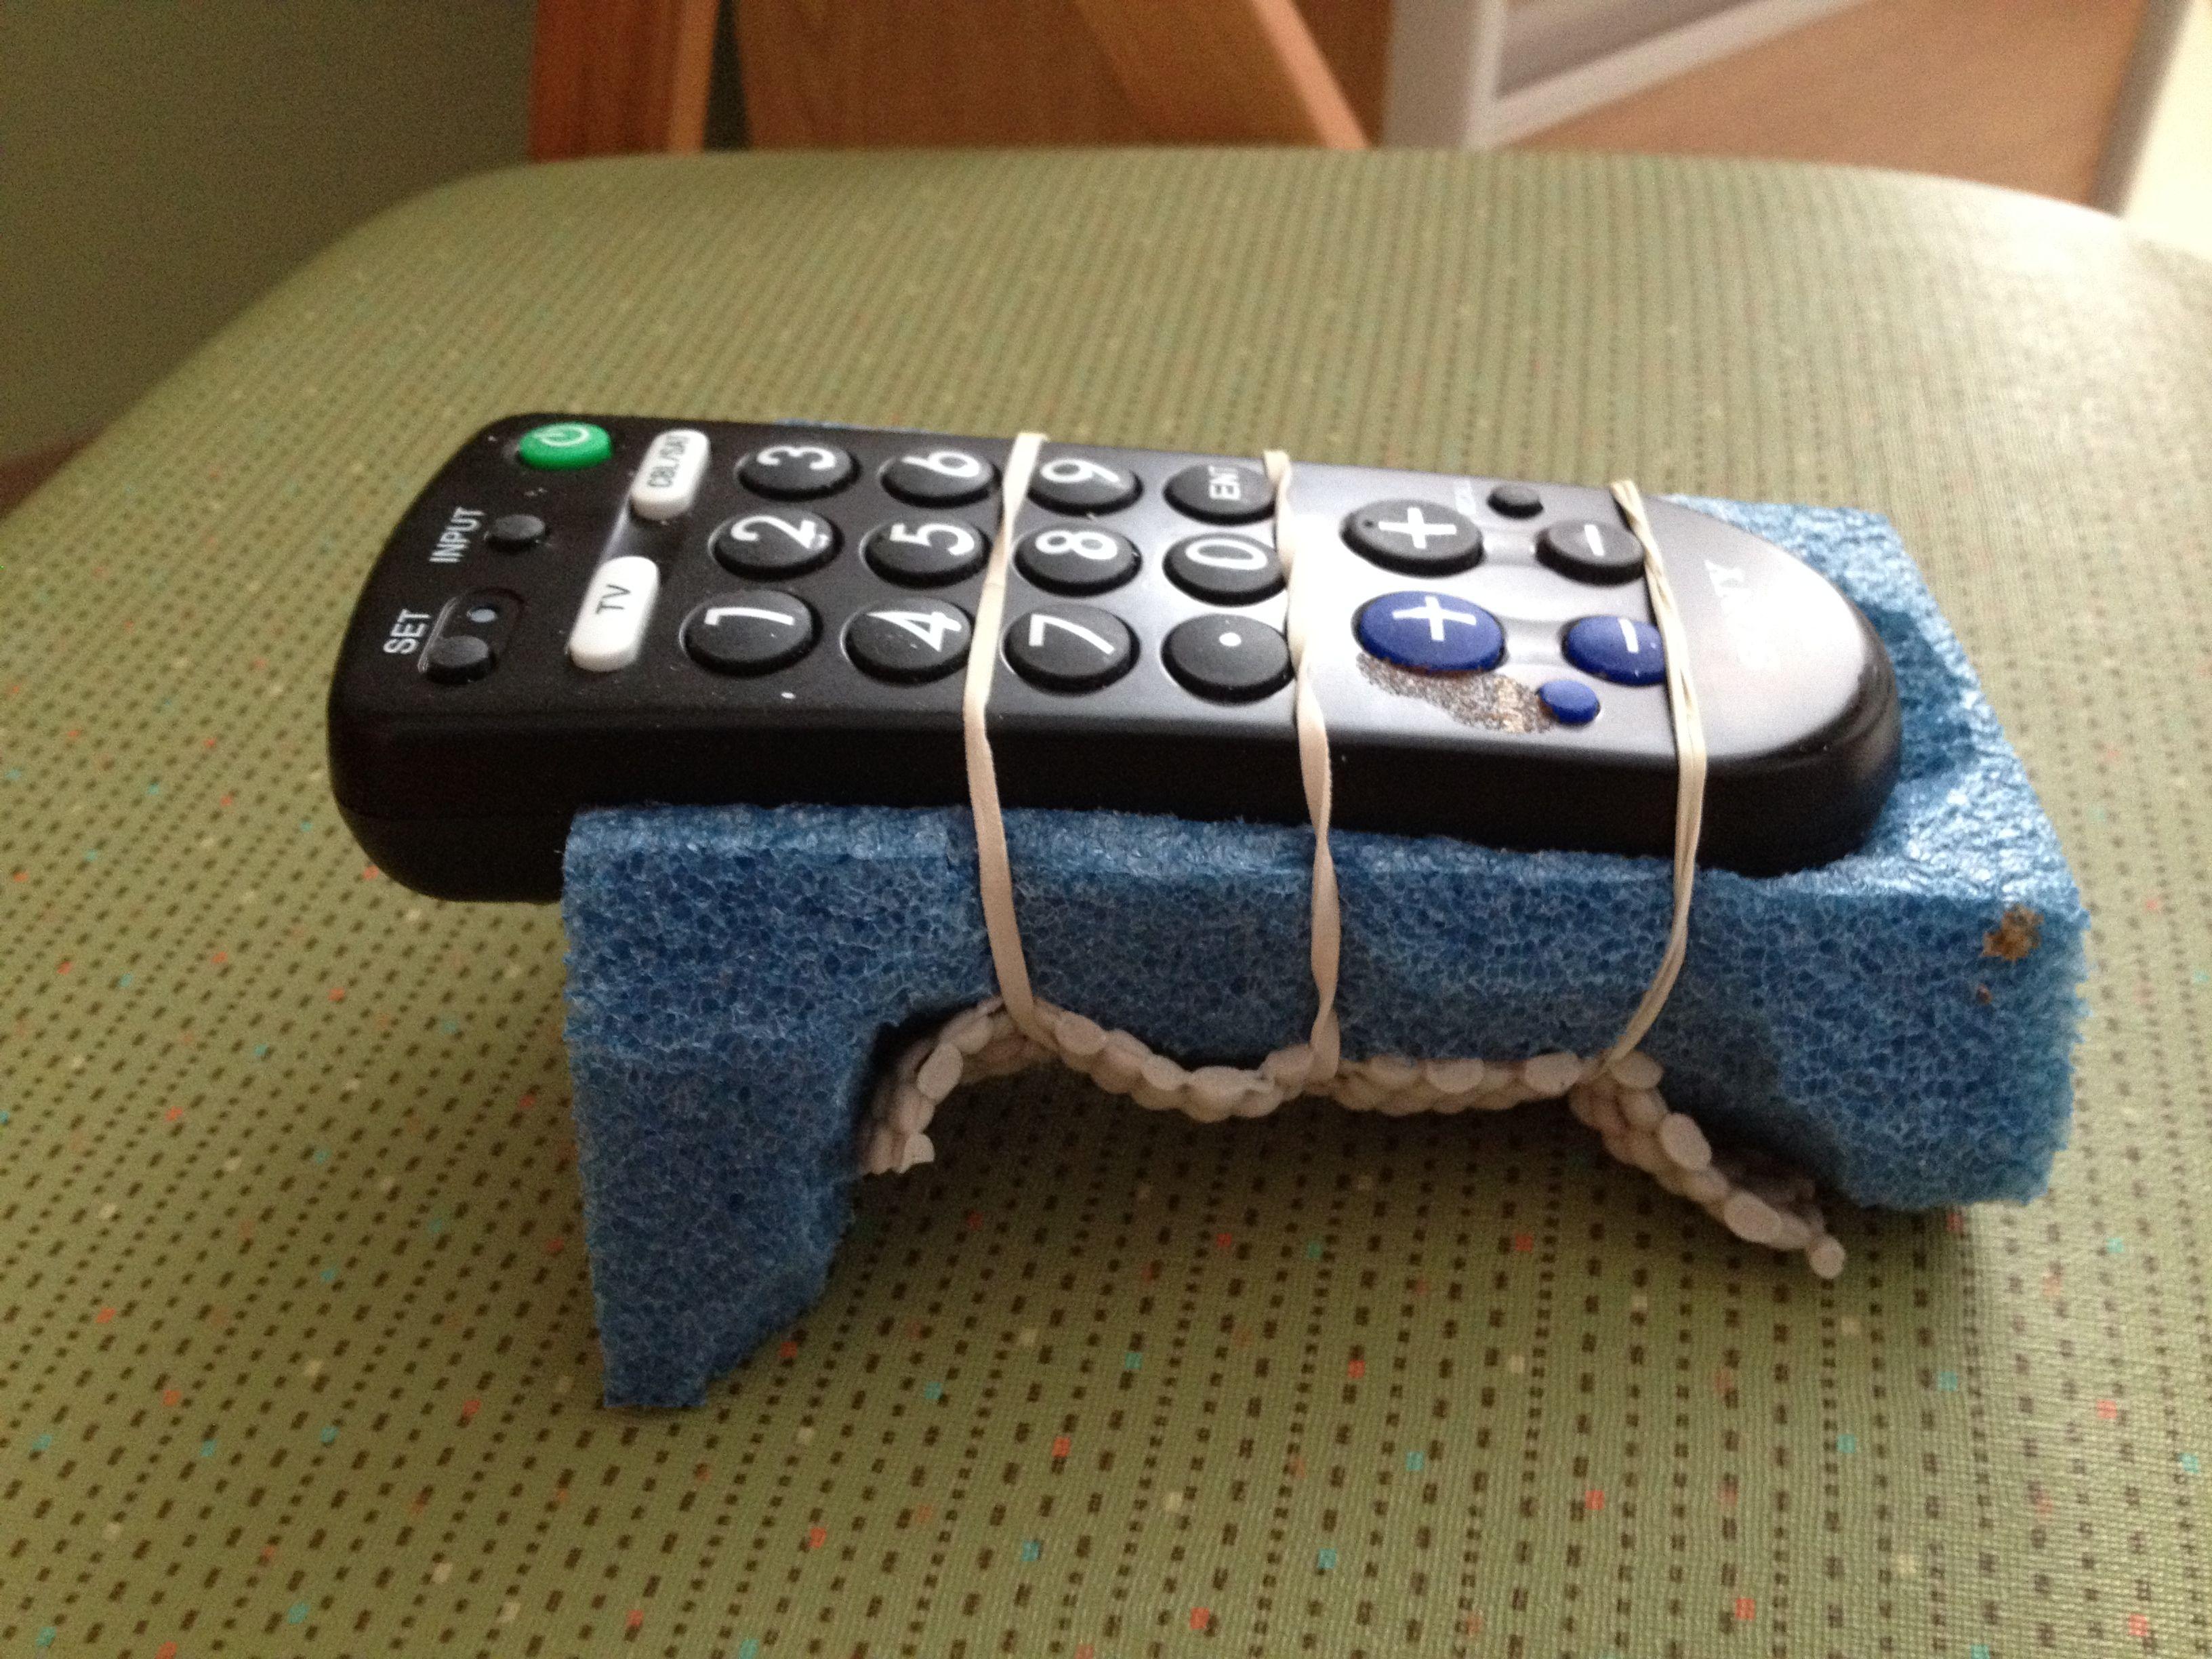 25+ unique Remote holder ideas on Pinterest | Remote, Remote ...